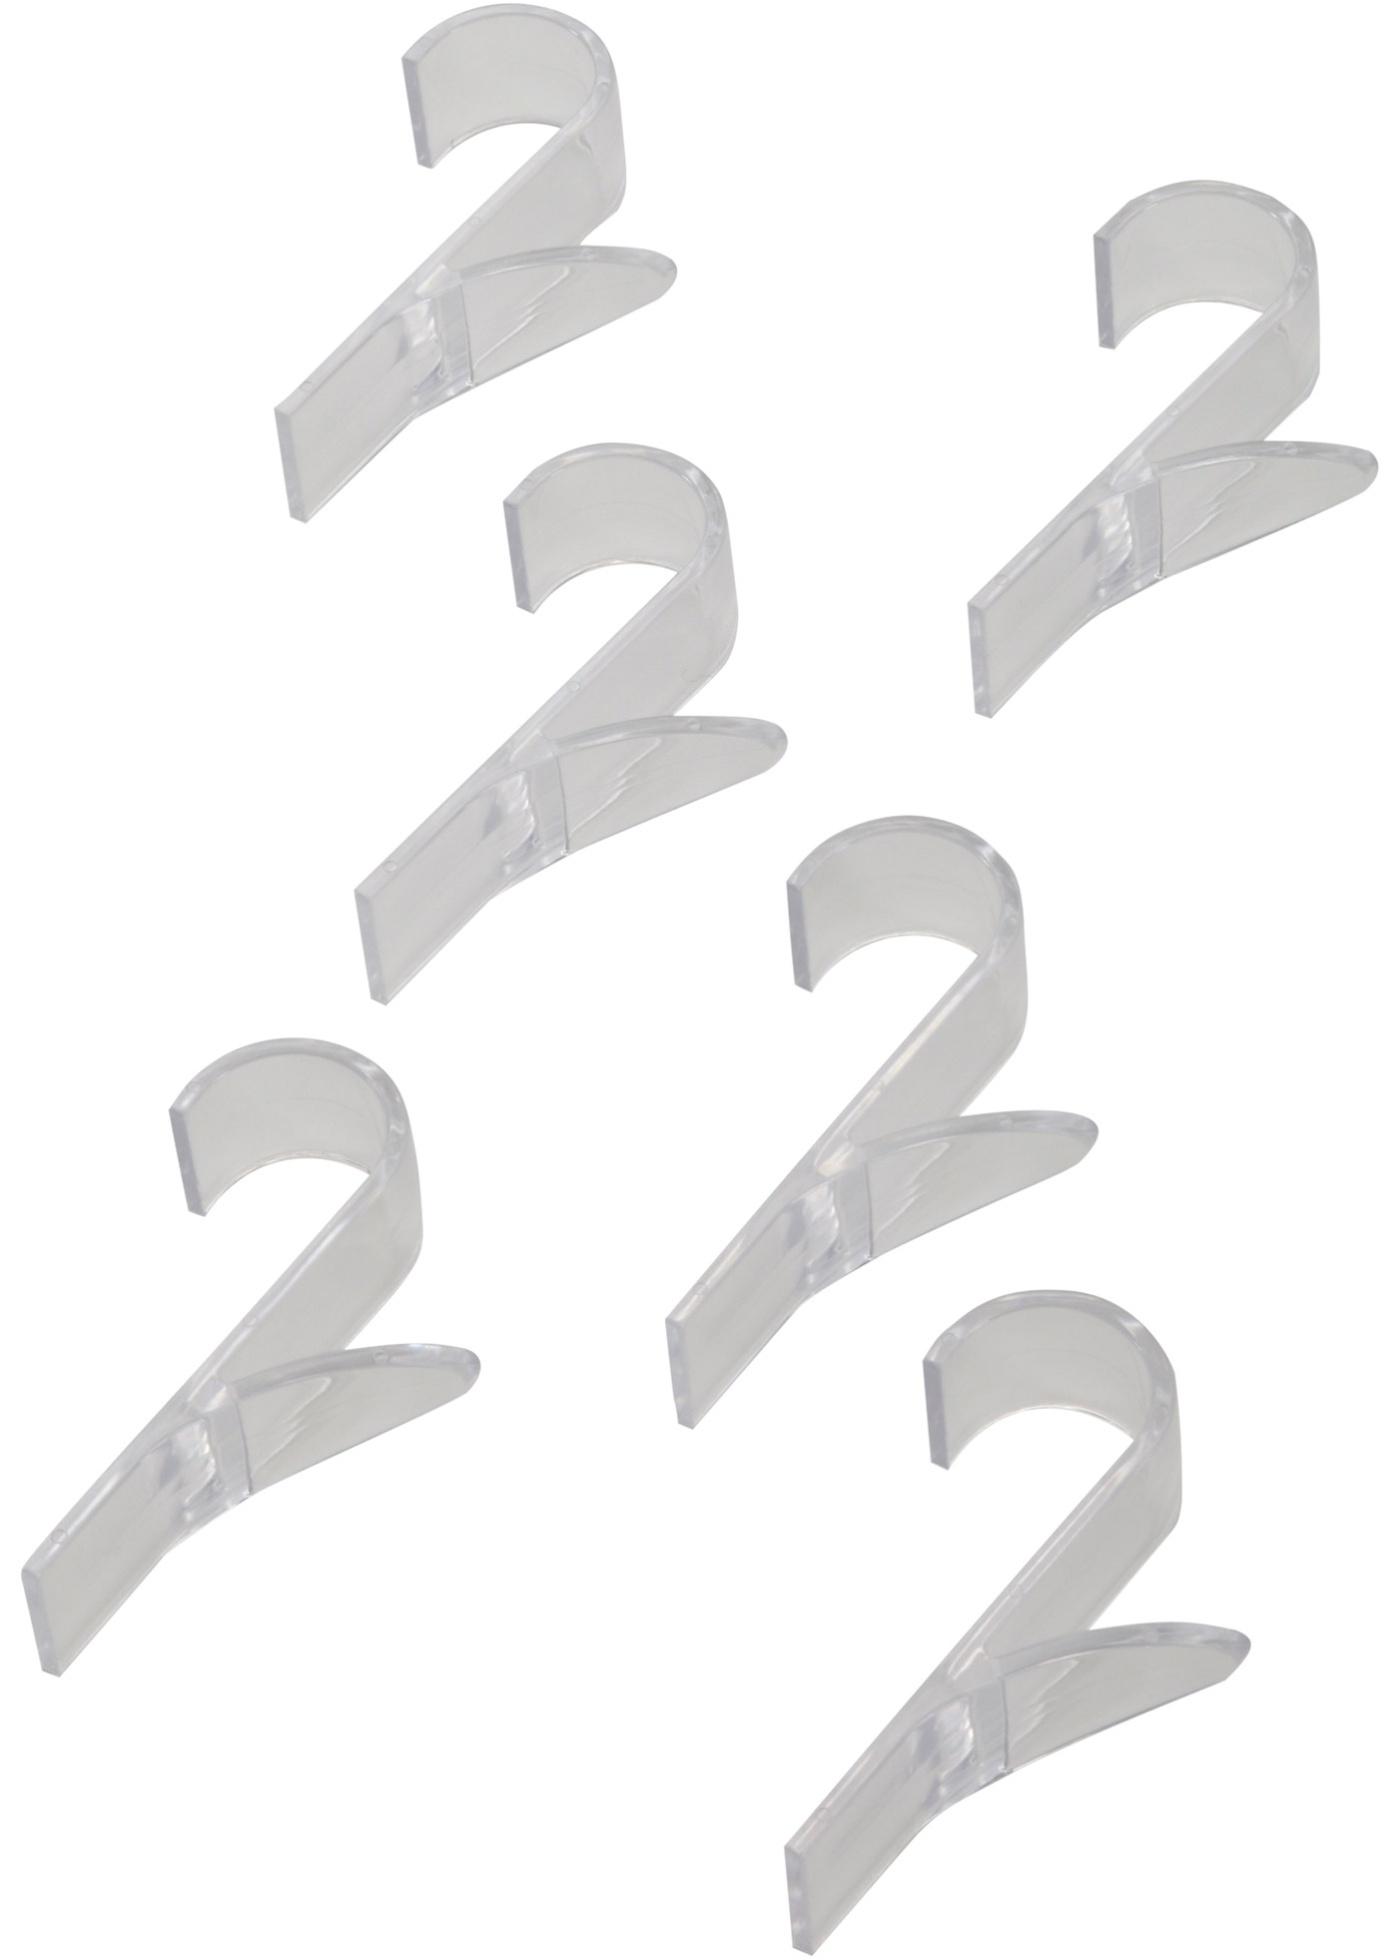 Radiatorhaakjes (6-dlg. set)